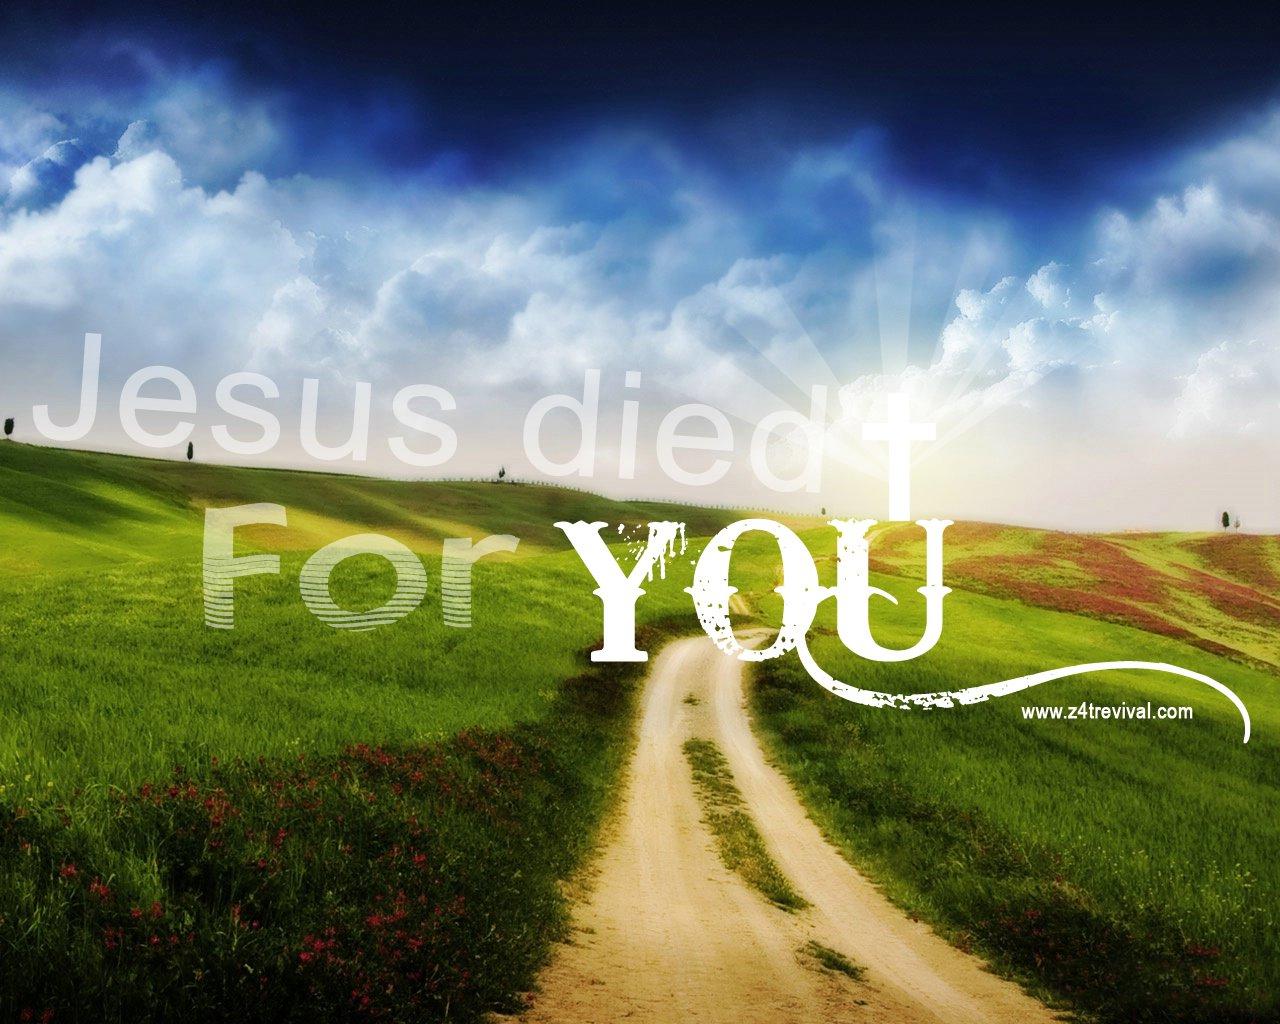 http://1.bp.blogspot.com/_0YWLpRbQZdE/SwrNaGWsVRI/AAAAAAAAAOw/Q6NKlh4xMRQ/s1600/jesus-died-for-you.jpg